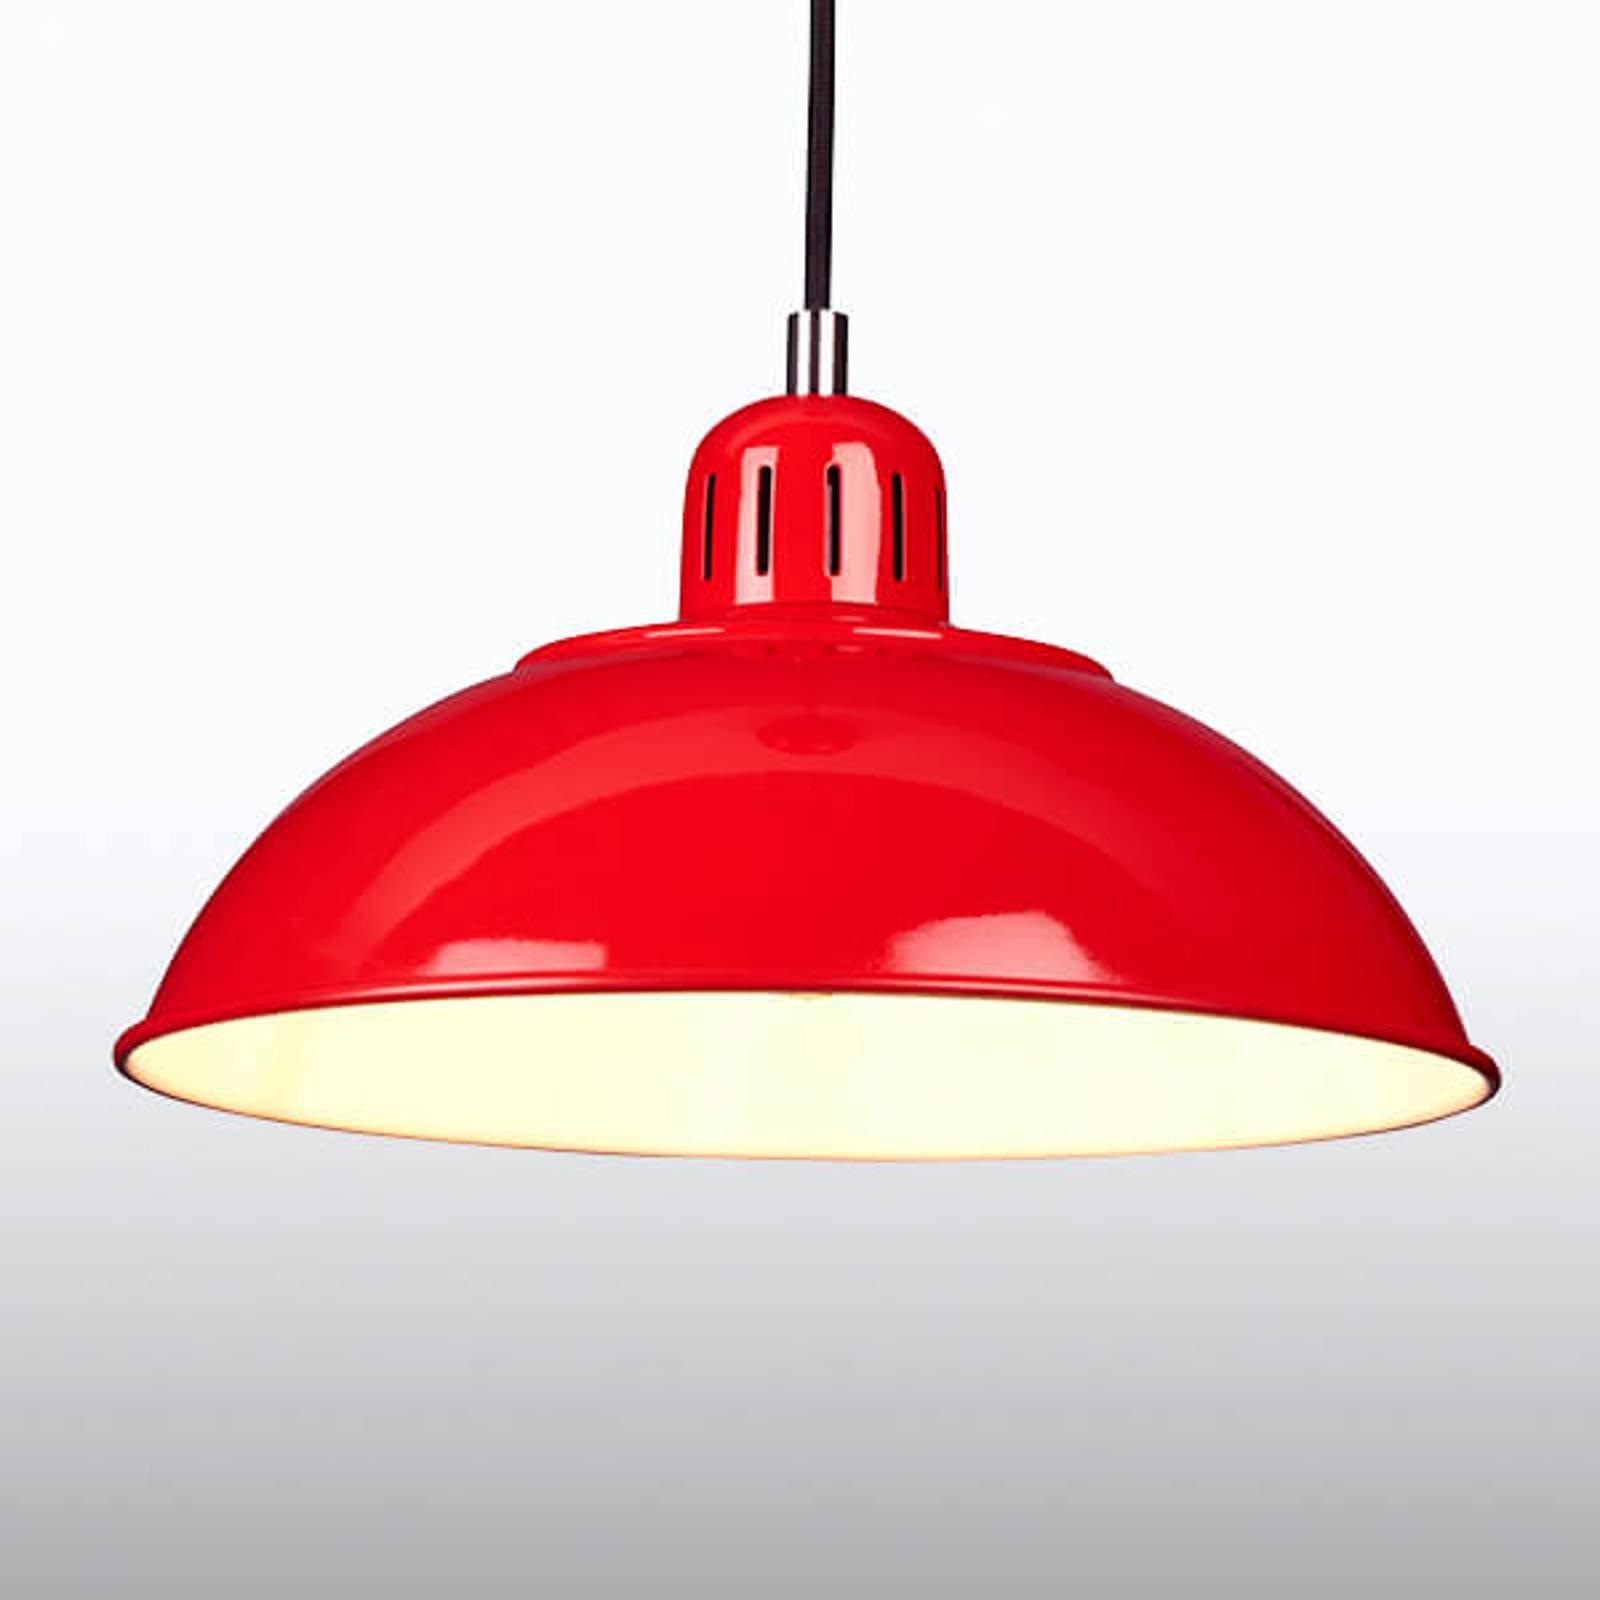 Rød hengelampe Franklin i Retro-design